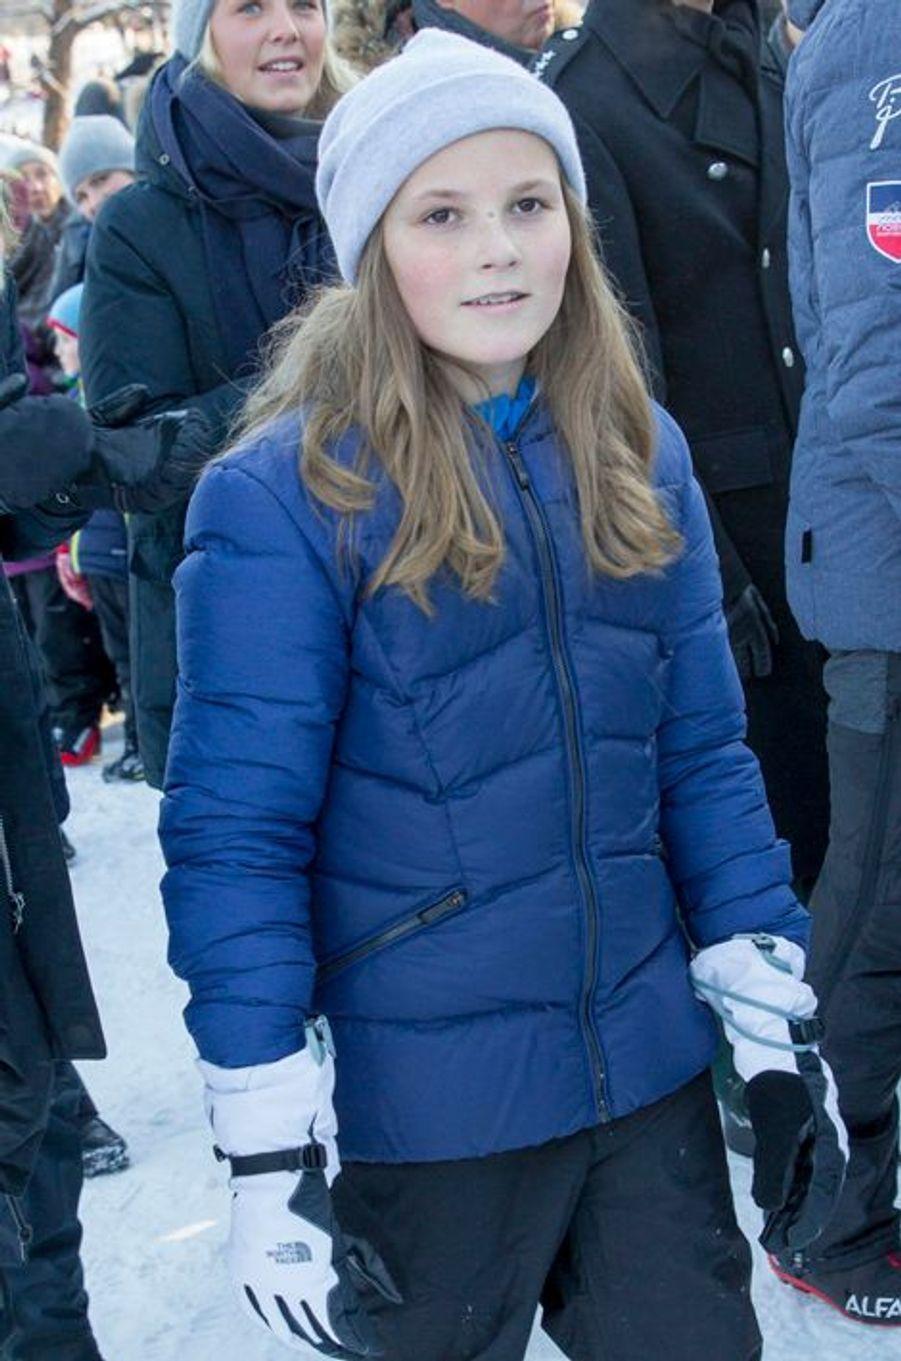 La princesse Ingrid Alexandra de Norvège à Oslo, le 17 janvier 2016